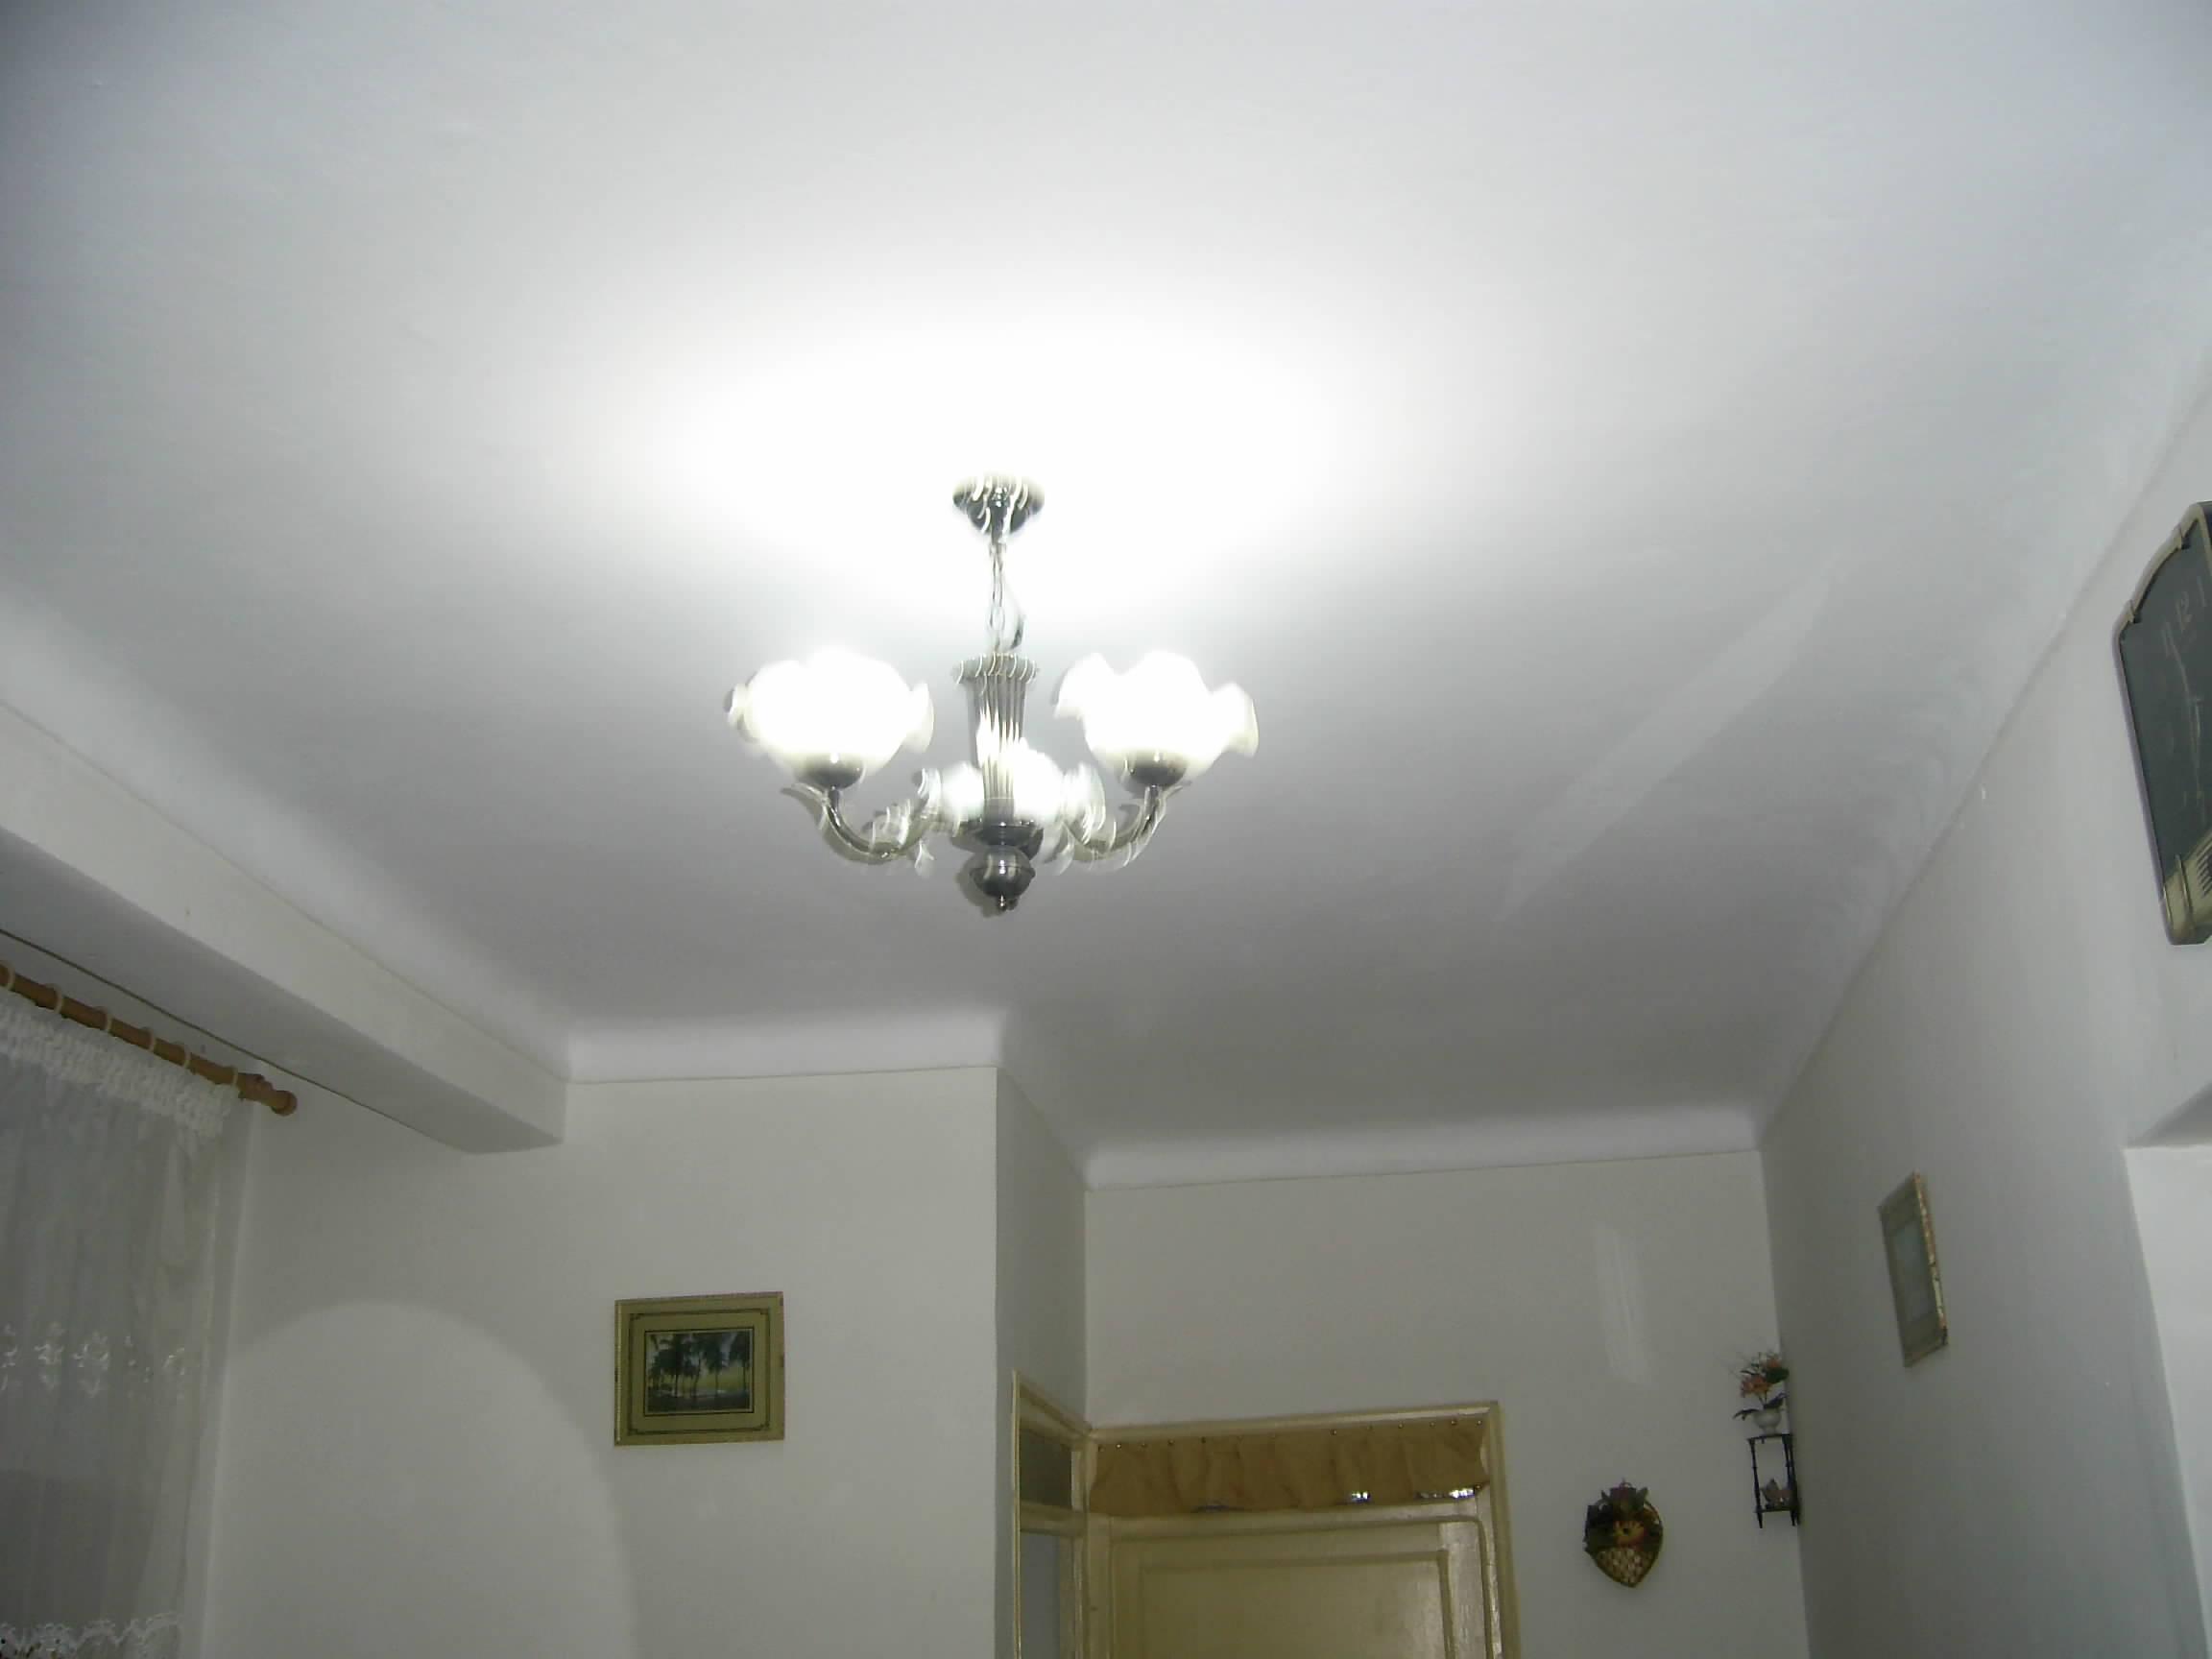 location appartement essaouira maroc longue duree meuble appartement louer essaouira pas cher. Black Bedroom Furniture Sets. Home Design Ideas